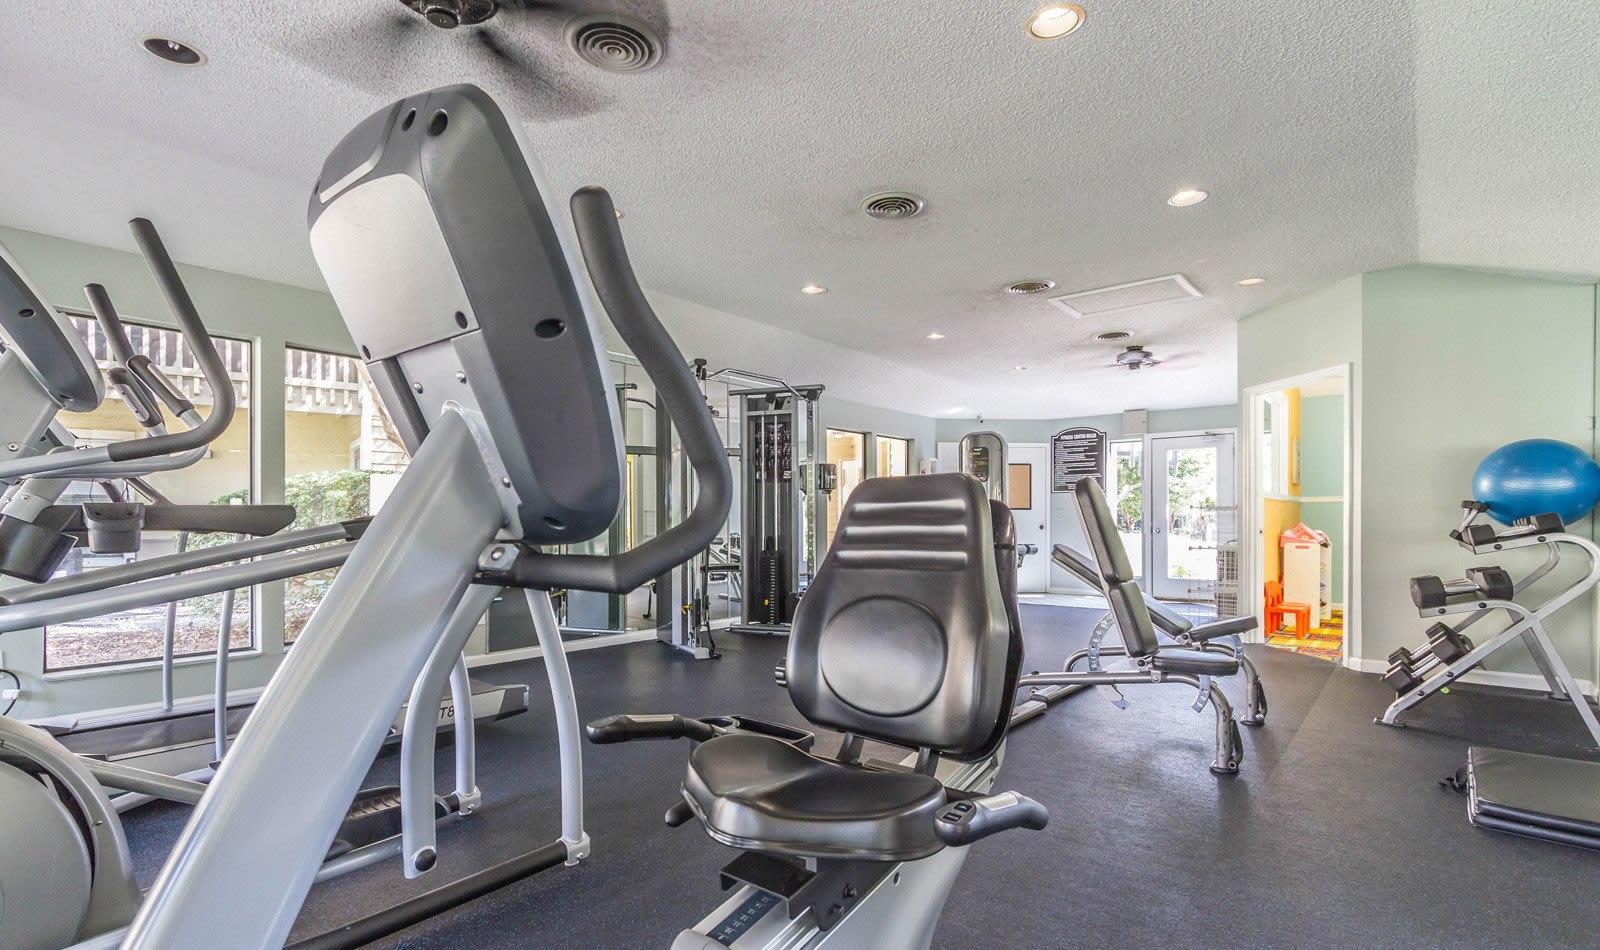 Fitness Center at Autumn Cove in Orange Park